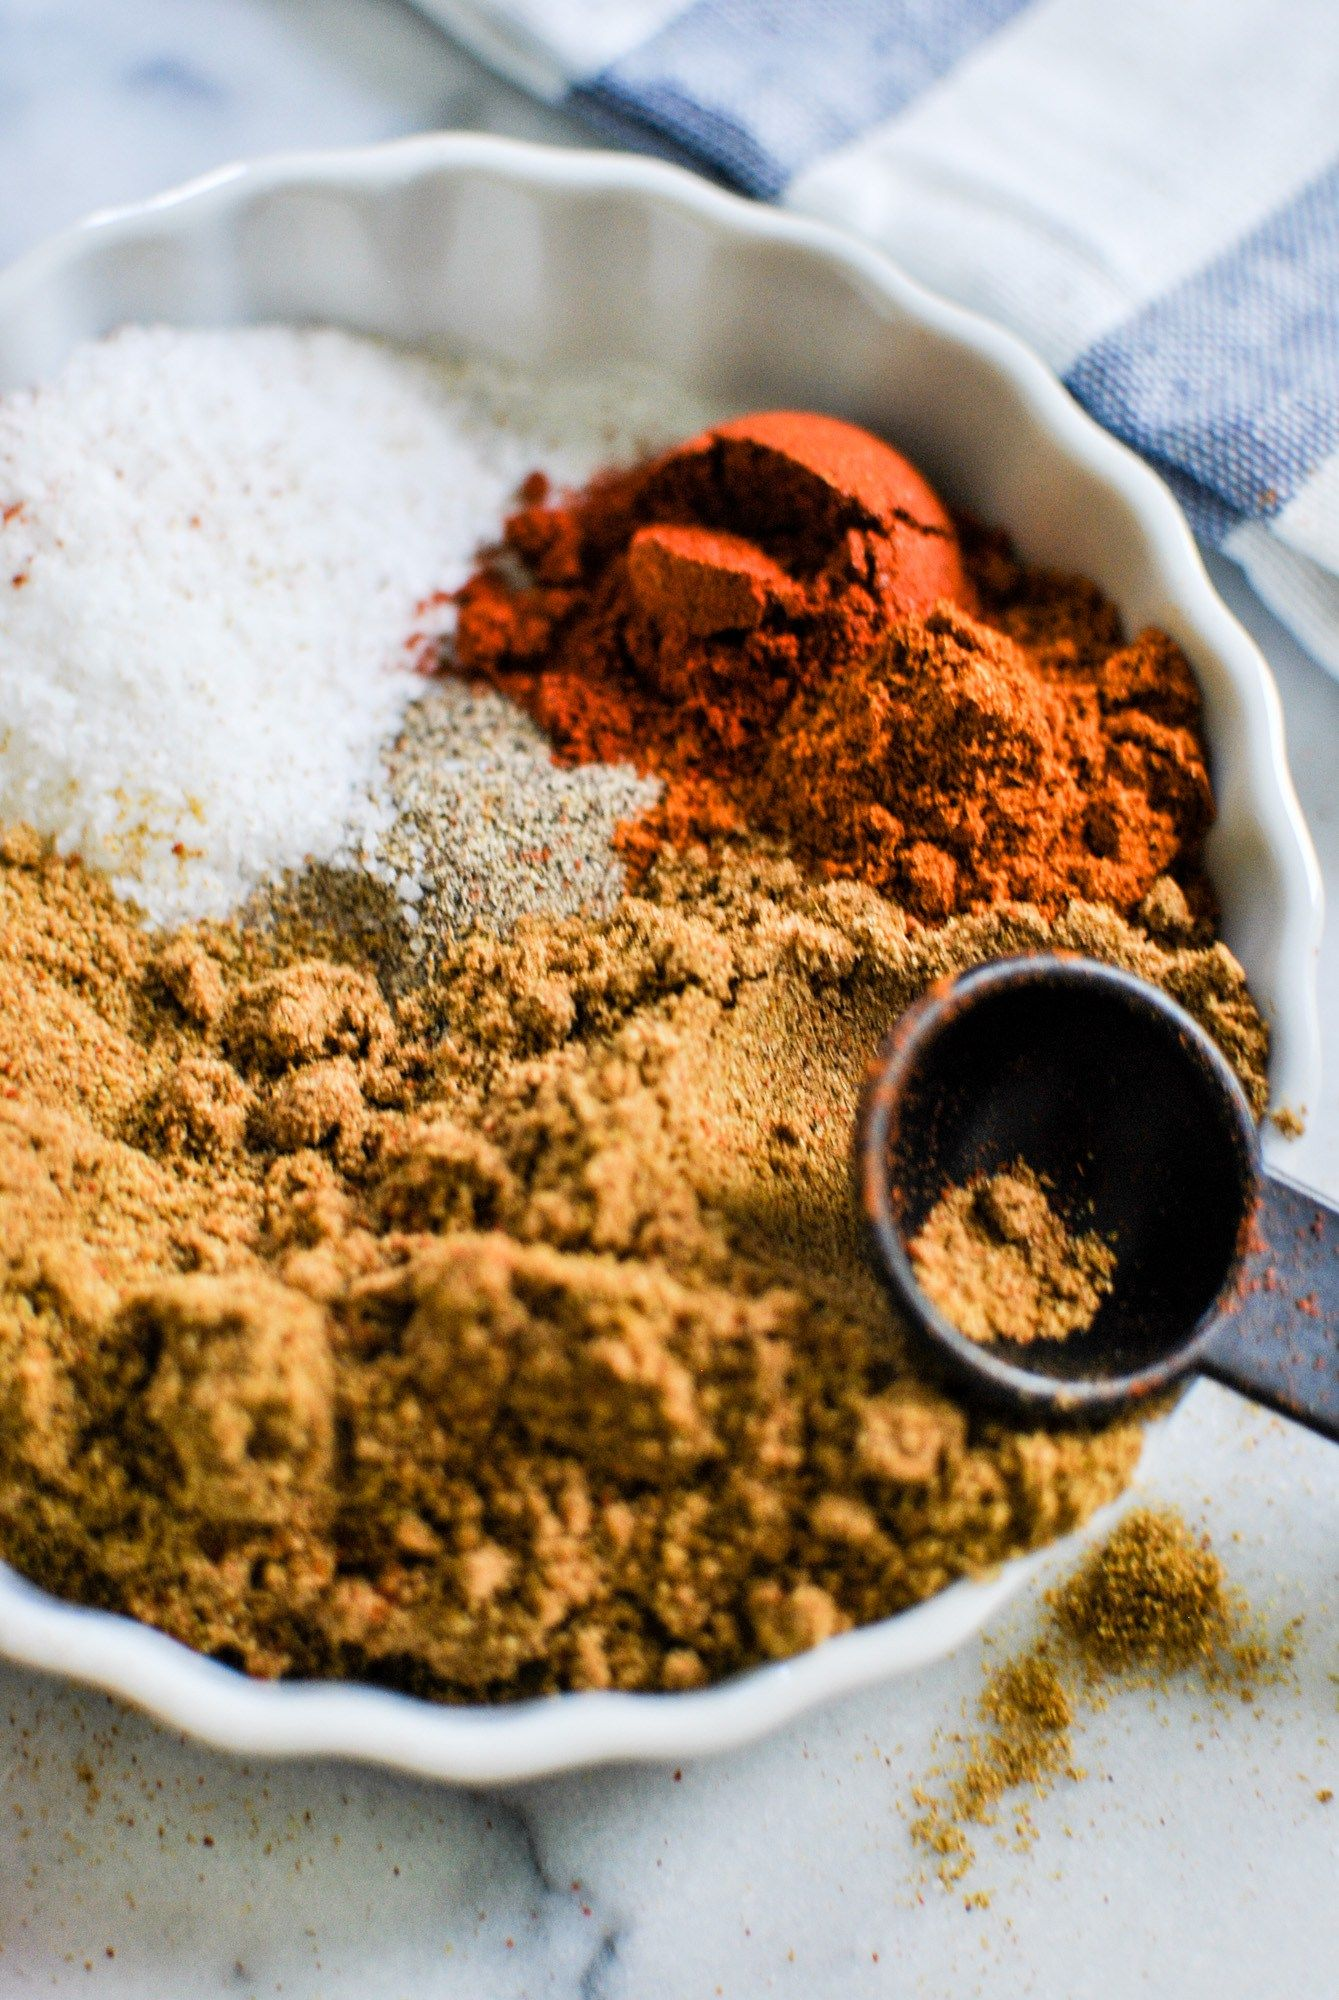 Taco Seasoning Recipe (With images) Taco seasoning